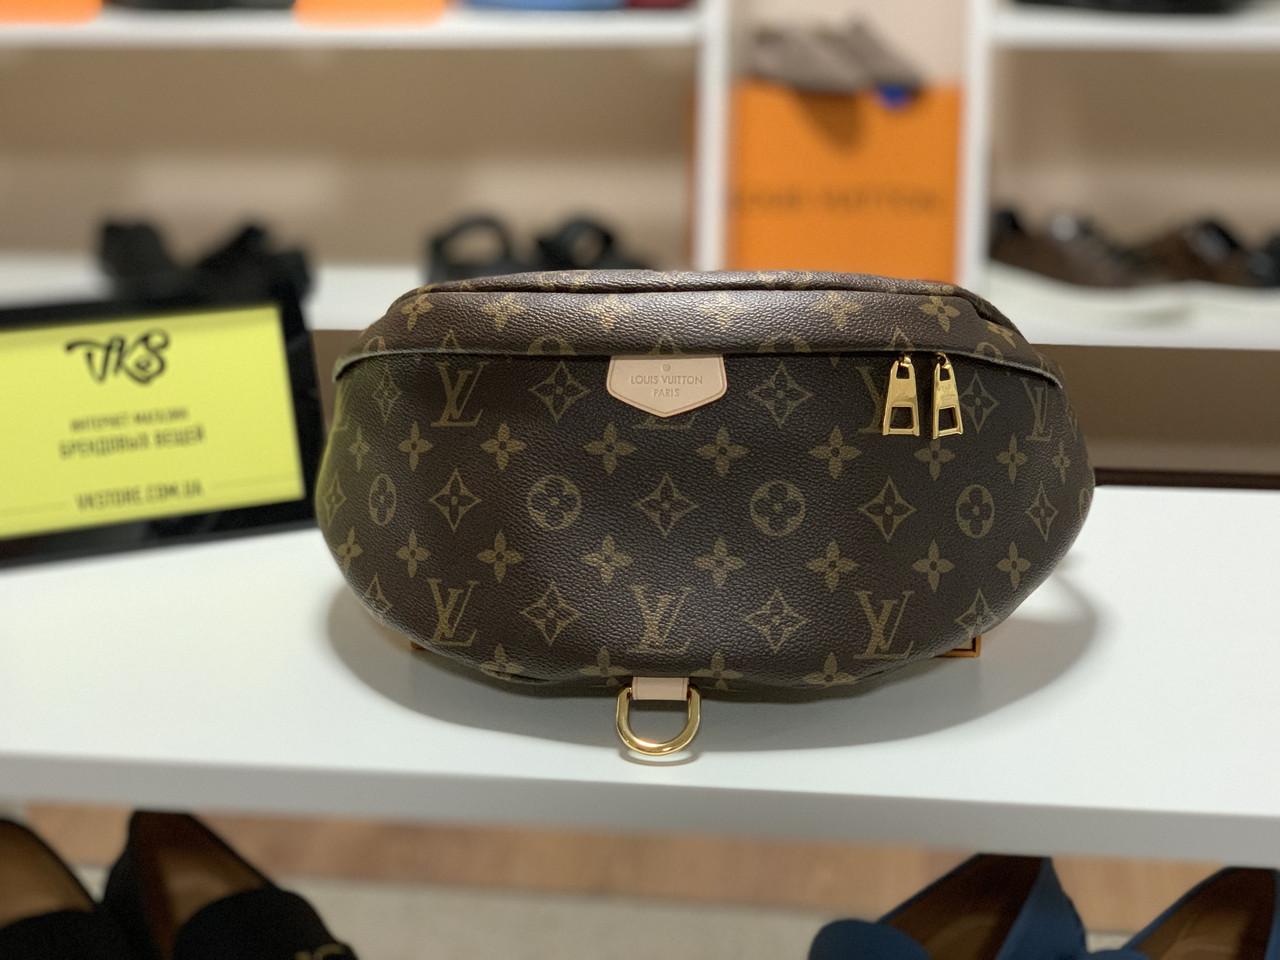 fa52c9b0c39b Женская сумка на пояс Louis Vuitton Bumbag | vkstore.com.ua